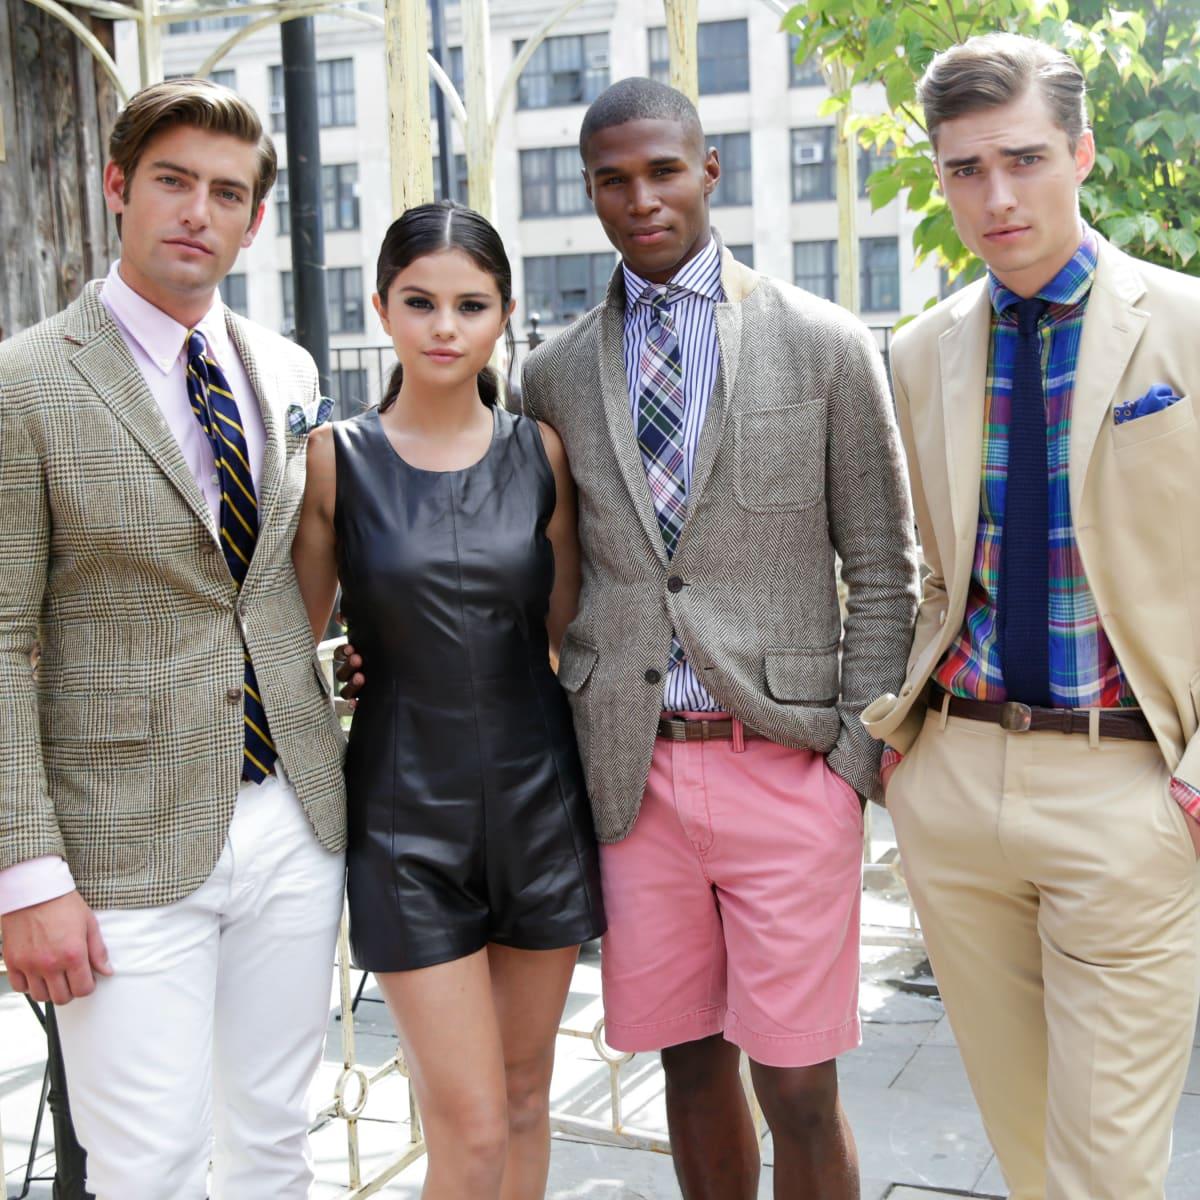 Selena Gomez and Ralph Lauren models at Polo Ralph Lauren presentation at New York Fashion Week